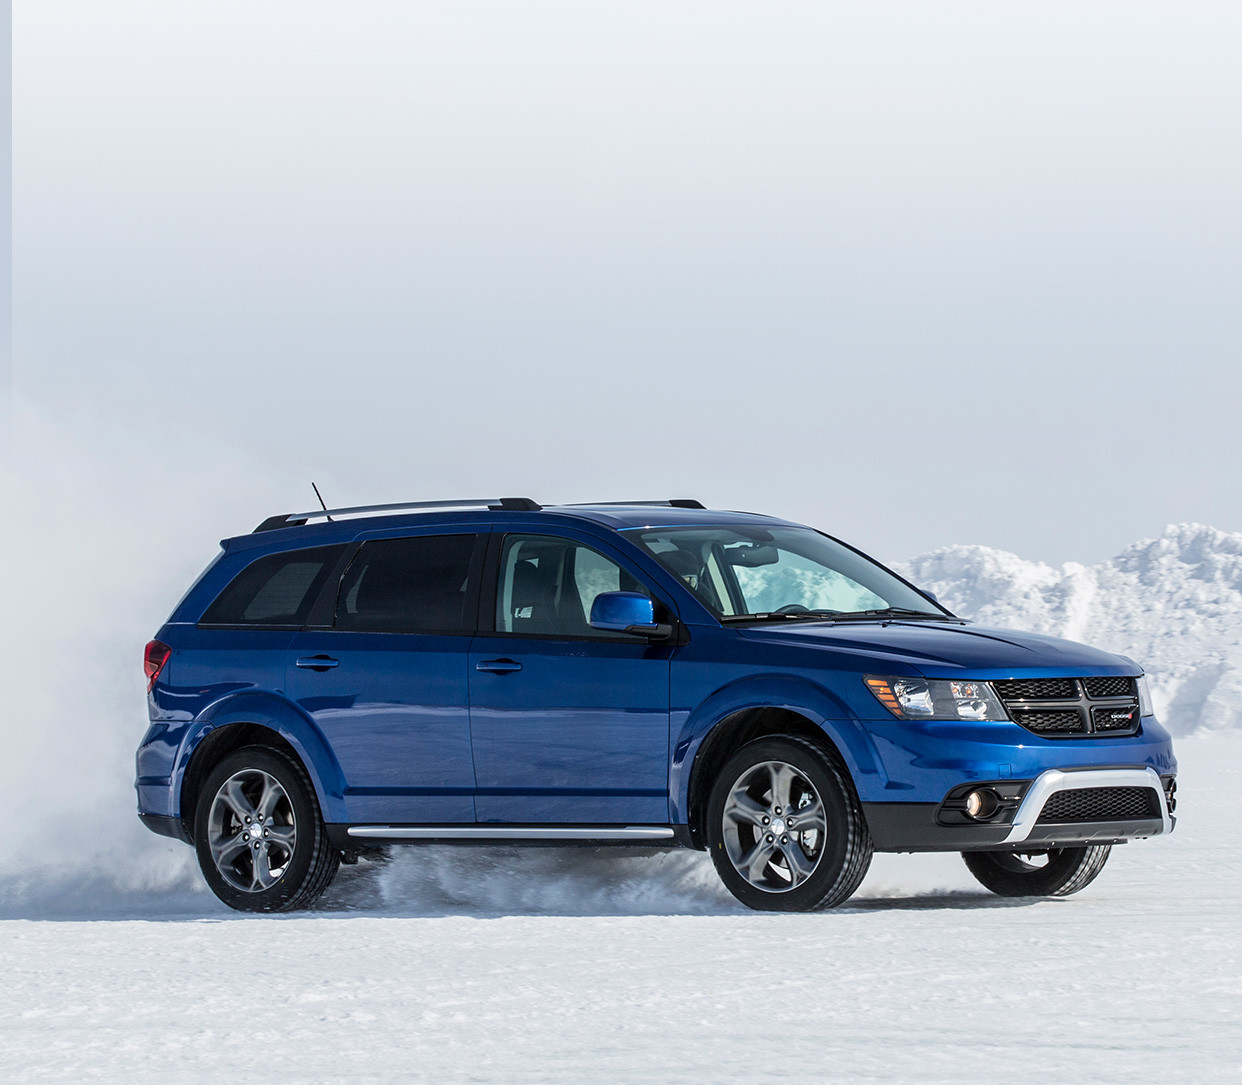 2019 Dodge Journey - Crossover SUV